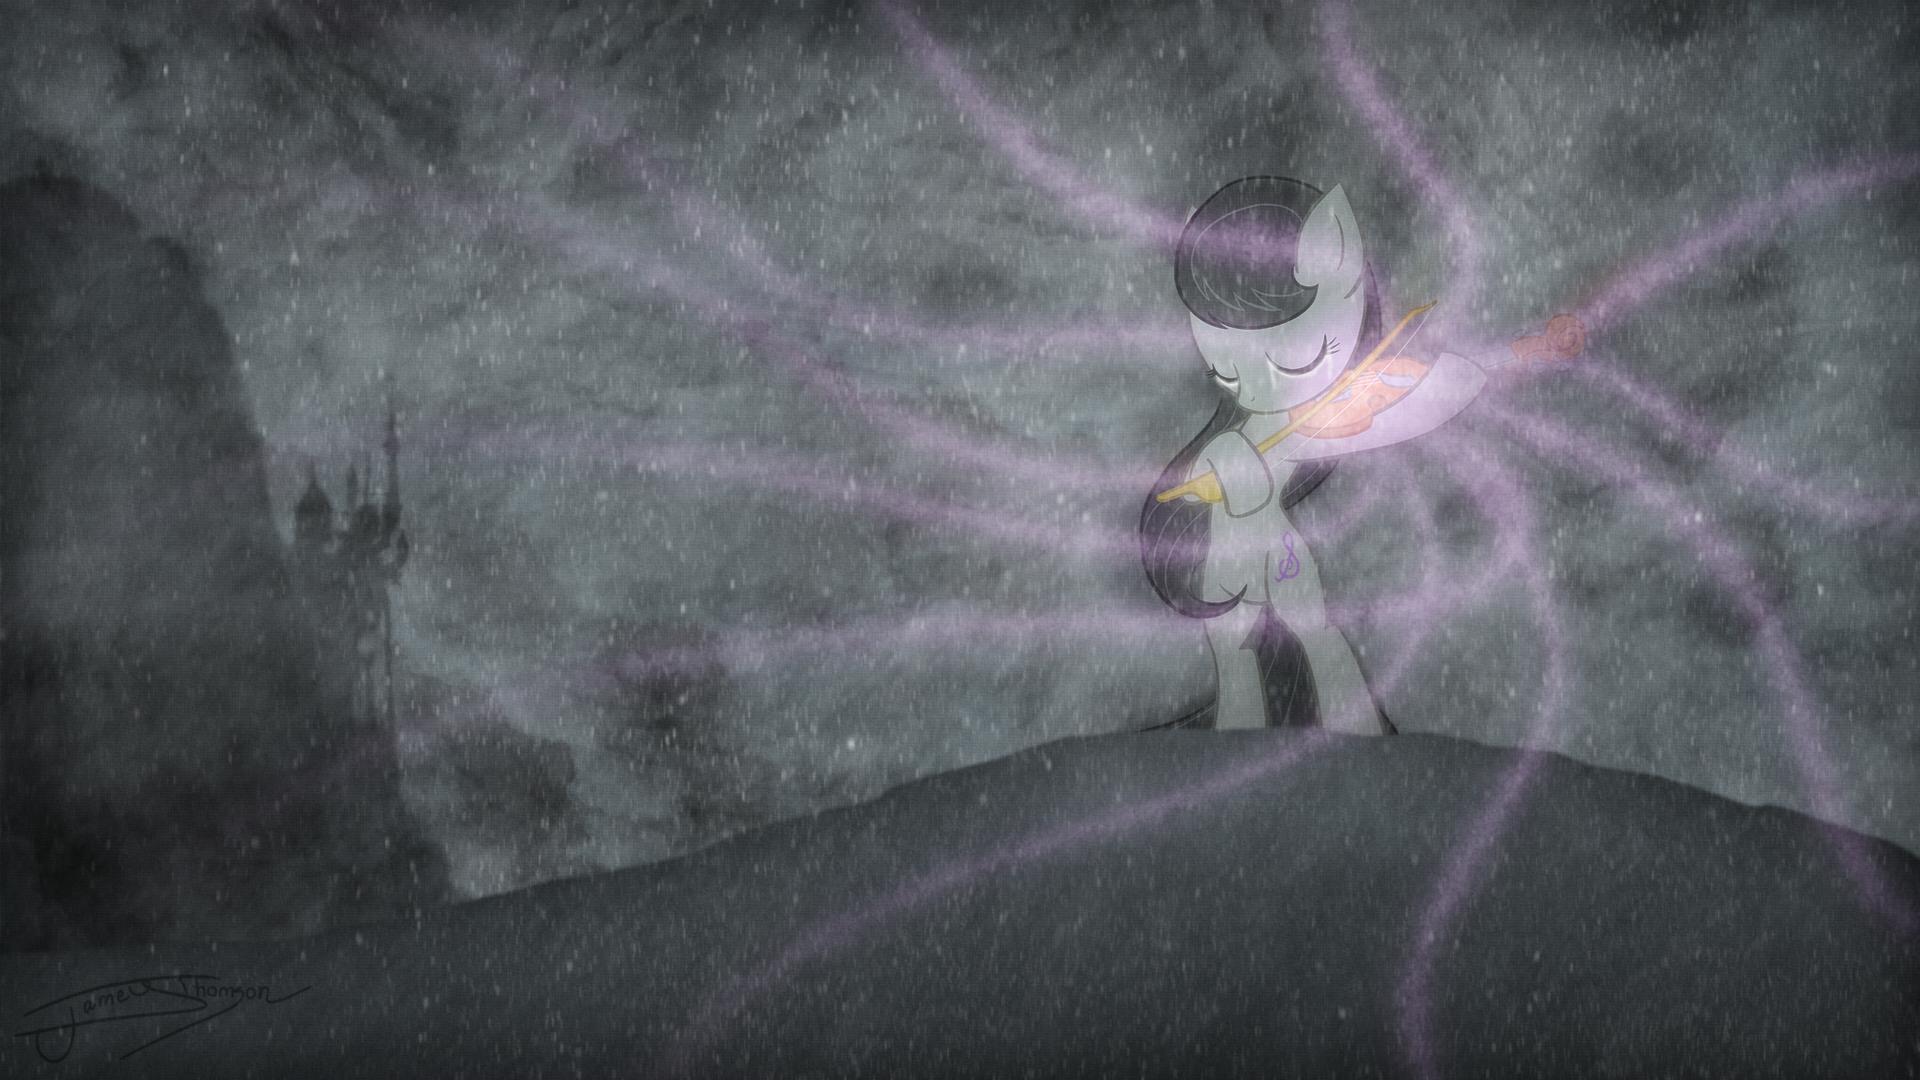 My Little Pony Octavia Melody Vector 1920x1080